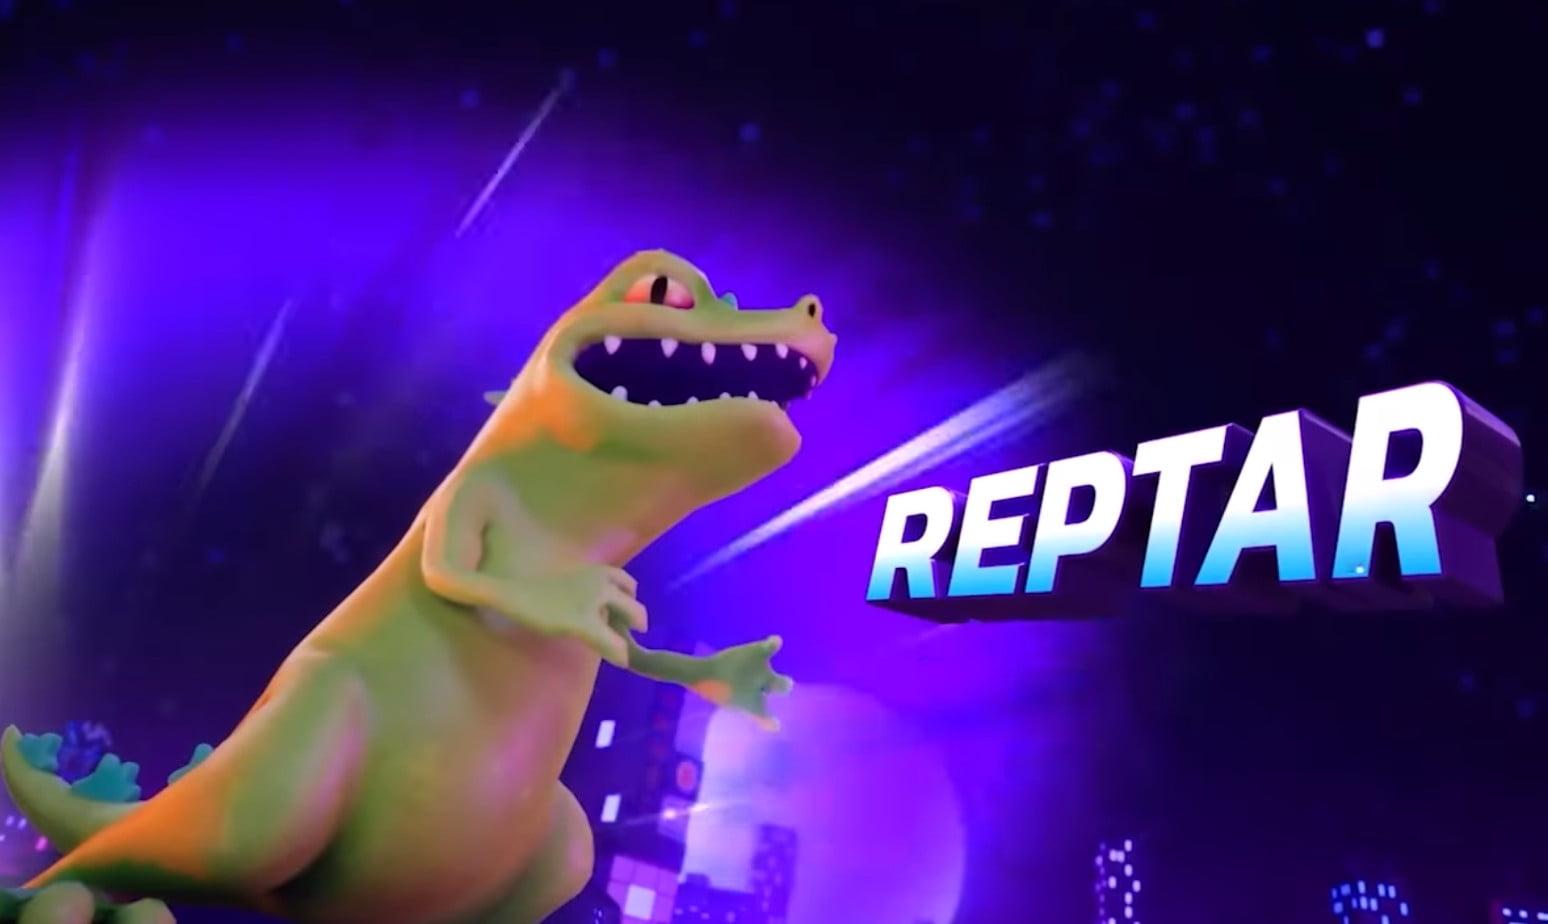 Repatr in Nickelodeon All-Star Brawl